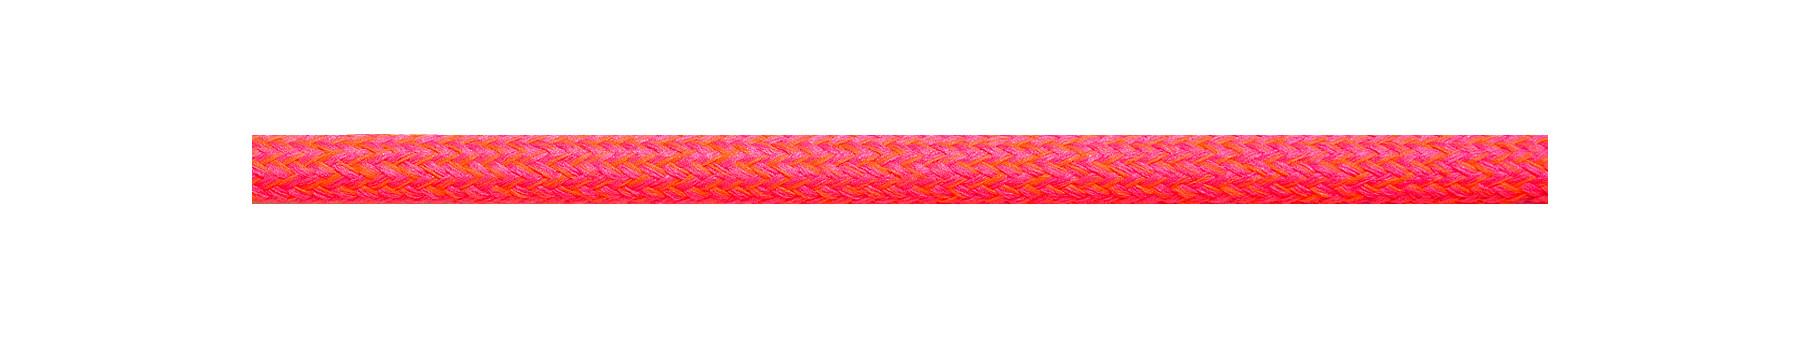 Textilkabel Neonpink-Orange